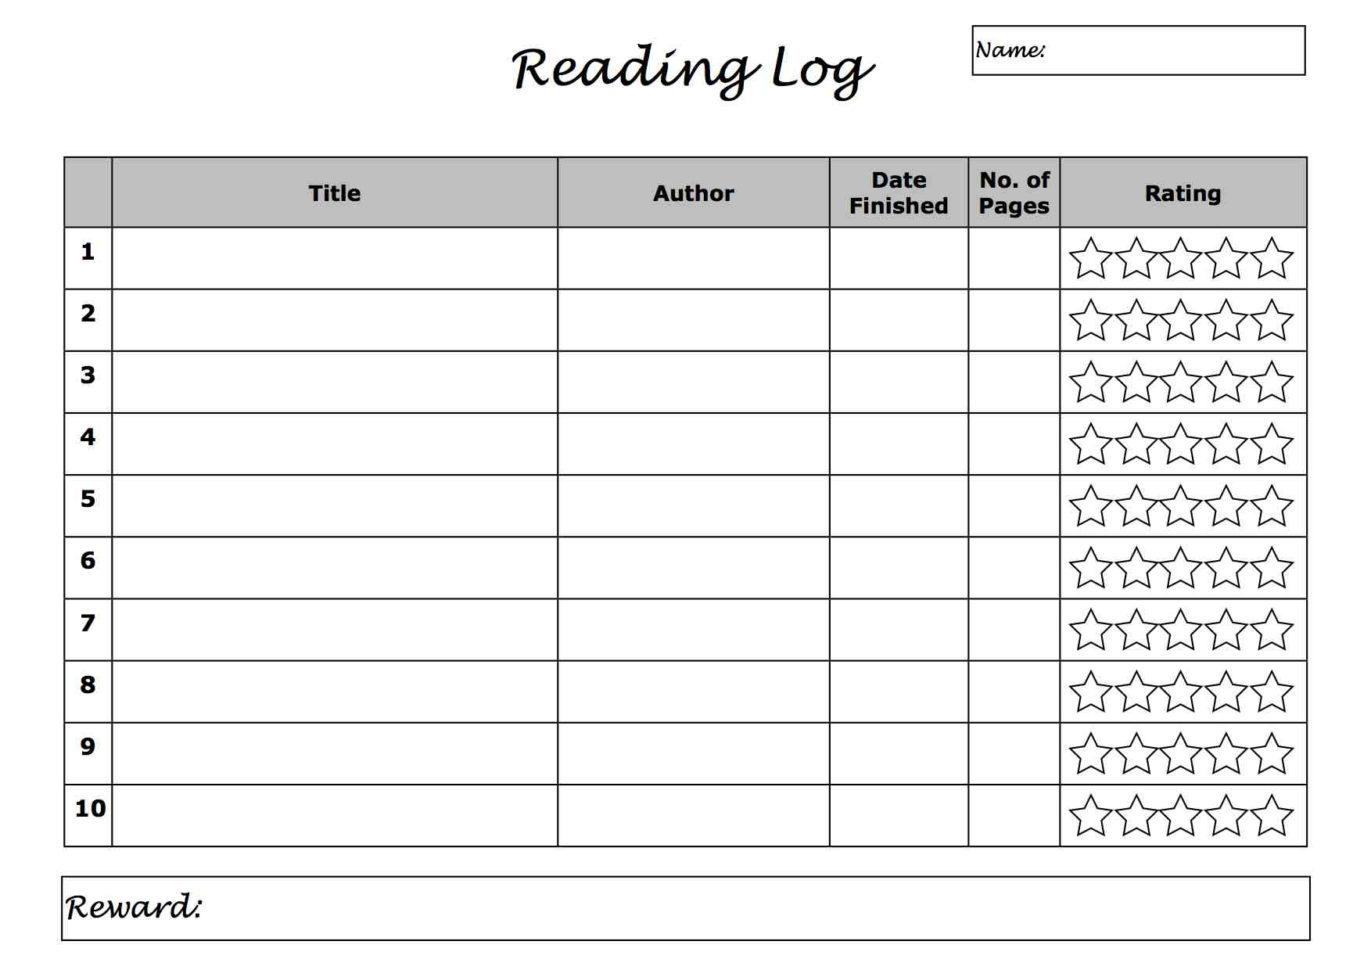 Reading Log Spreadsheet Spreadshee Reading Log